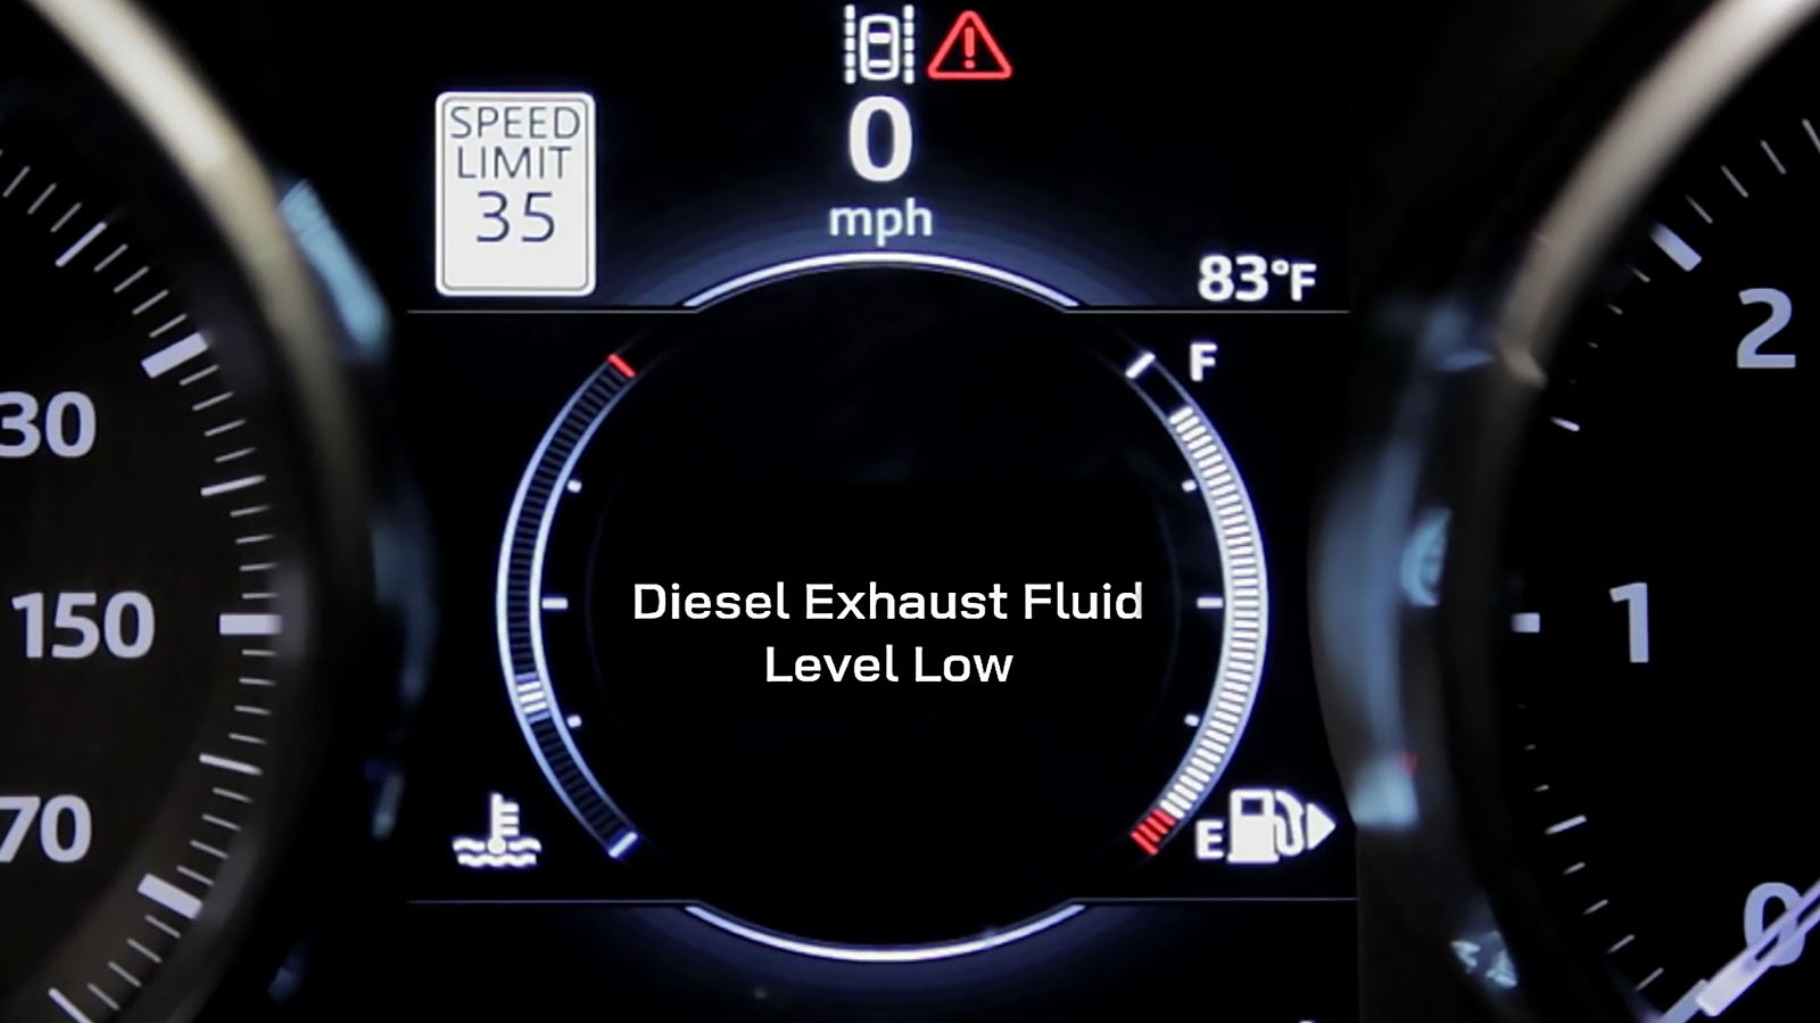 SCR Technology (AdBlue) - Diesel Exhaust Fluid (DEF